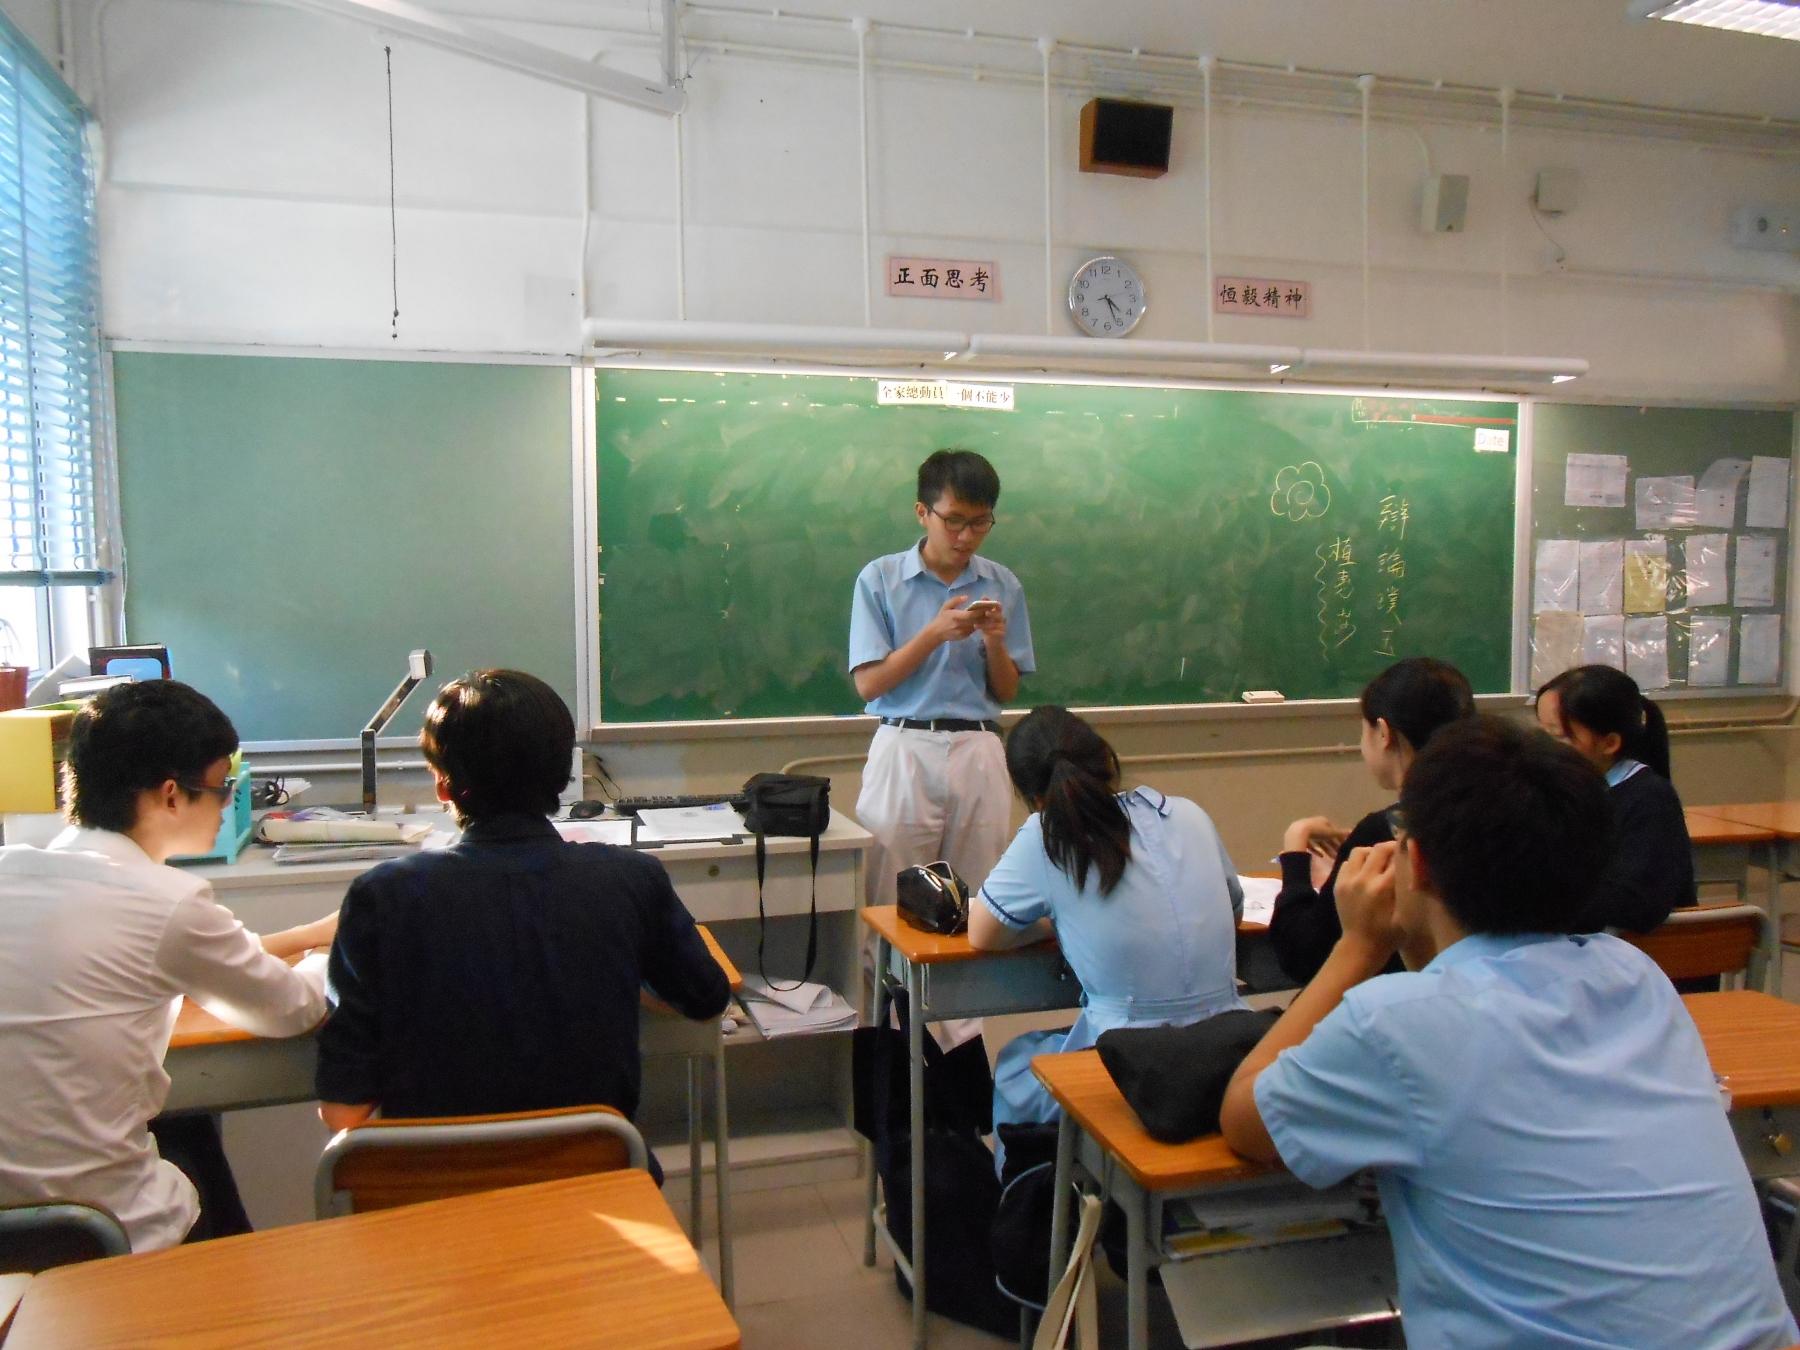 http://npc.edu.hk/sites/default/files/dscn9091_1.jpg